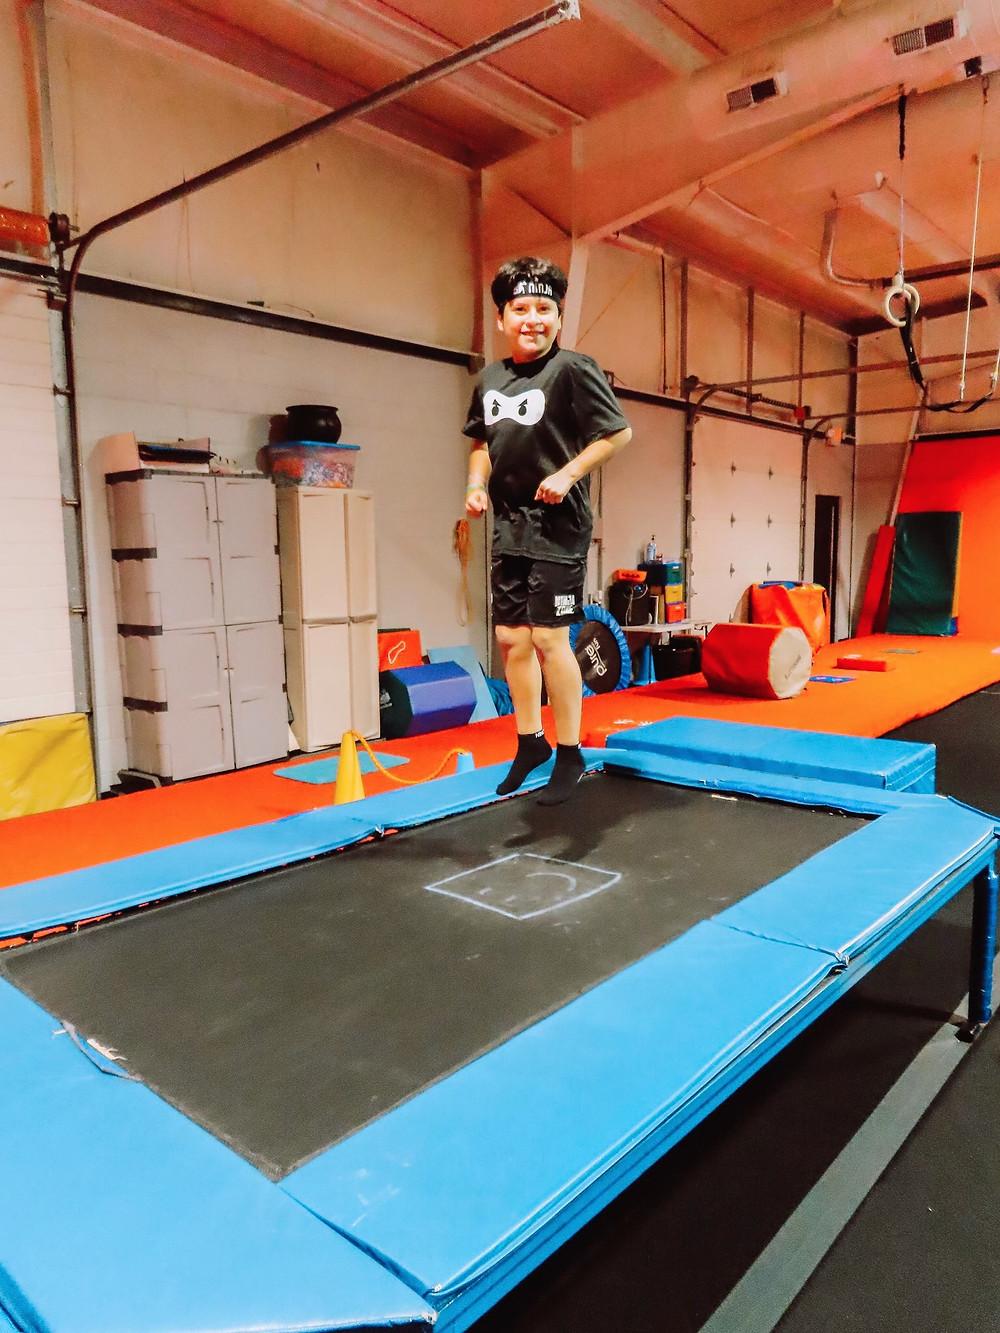 kids activities, indy with kids, ninjazone, ninjawork,